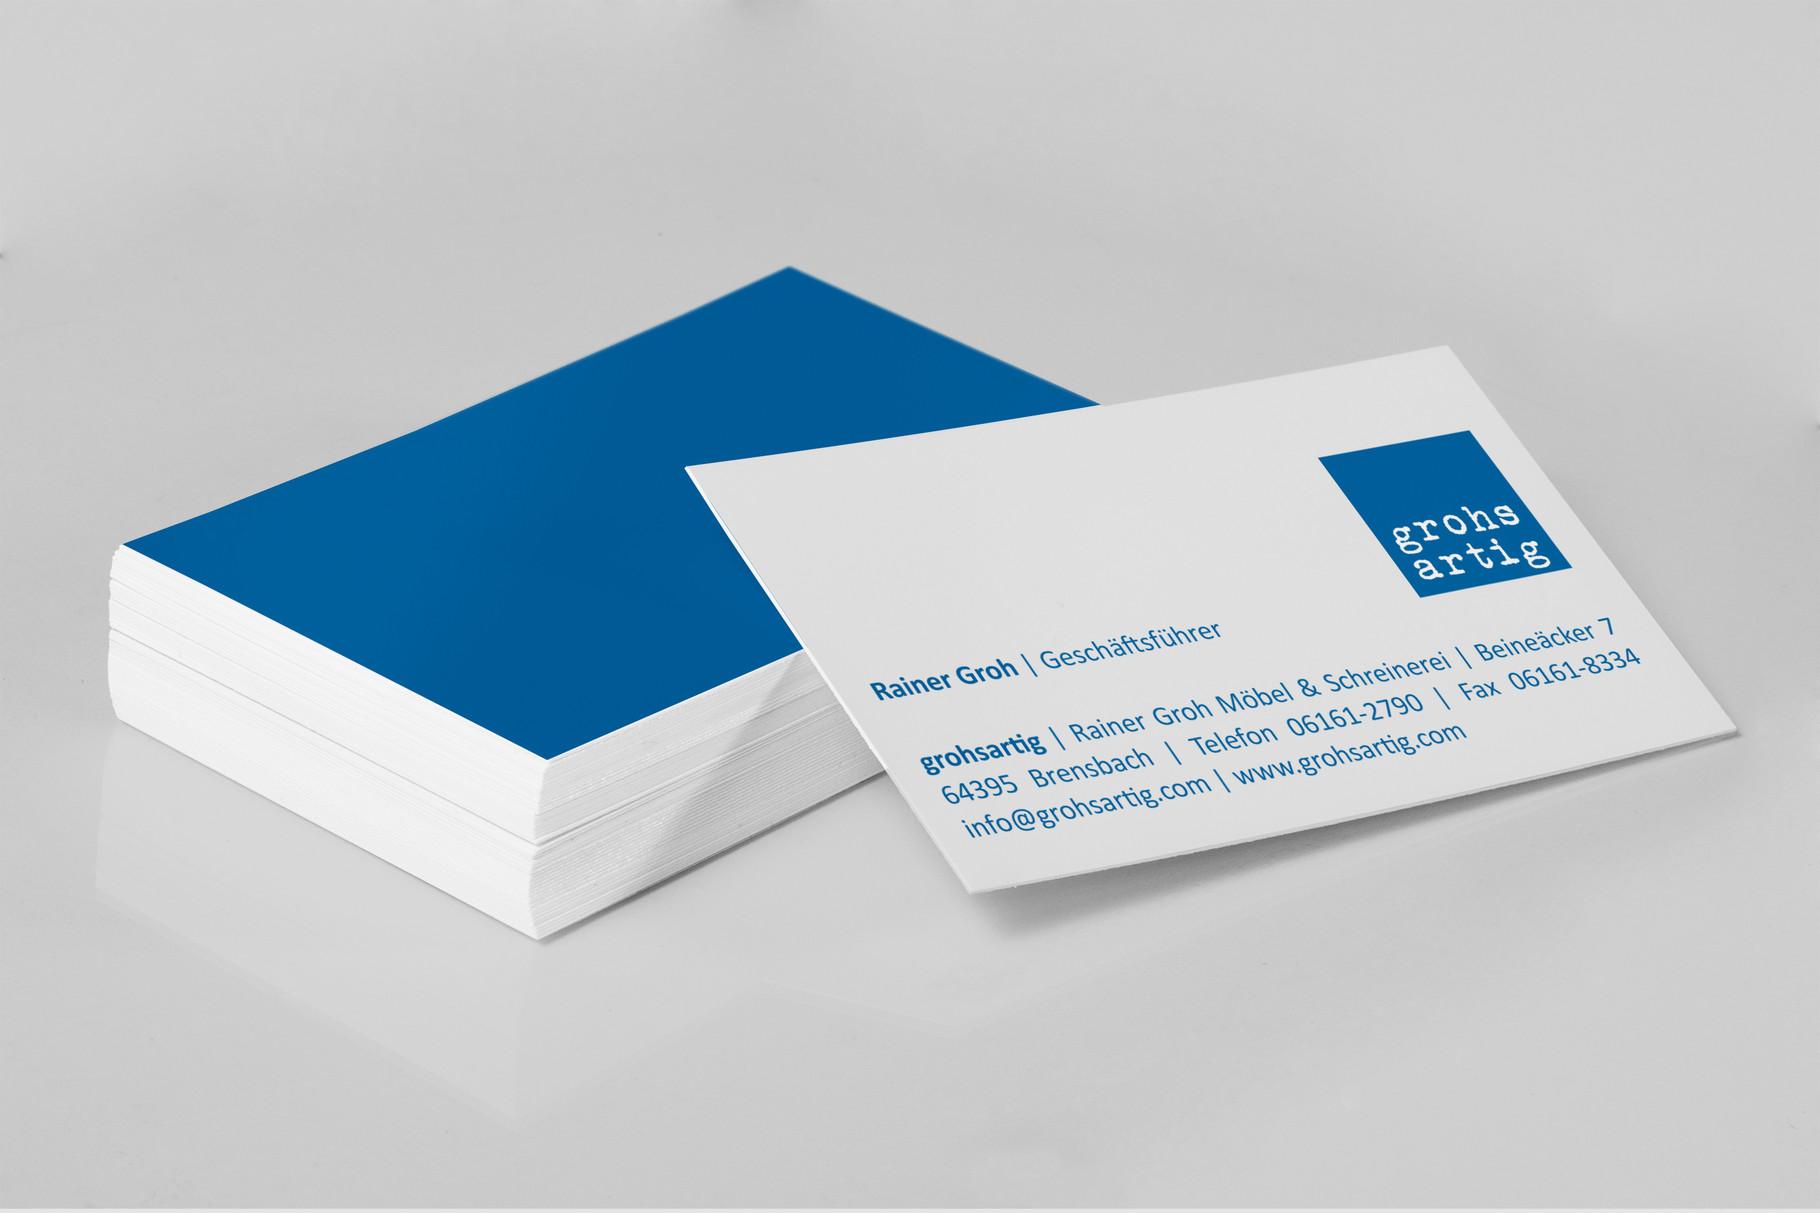 Logo, Logoentwicklung, Grafikdesign, Grafik, Gestaltung, Illustration, Grohsartig Visitenkarten